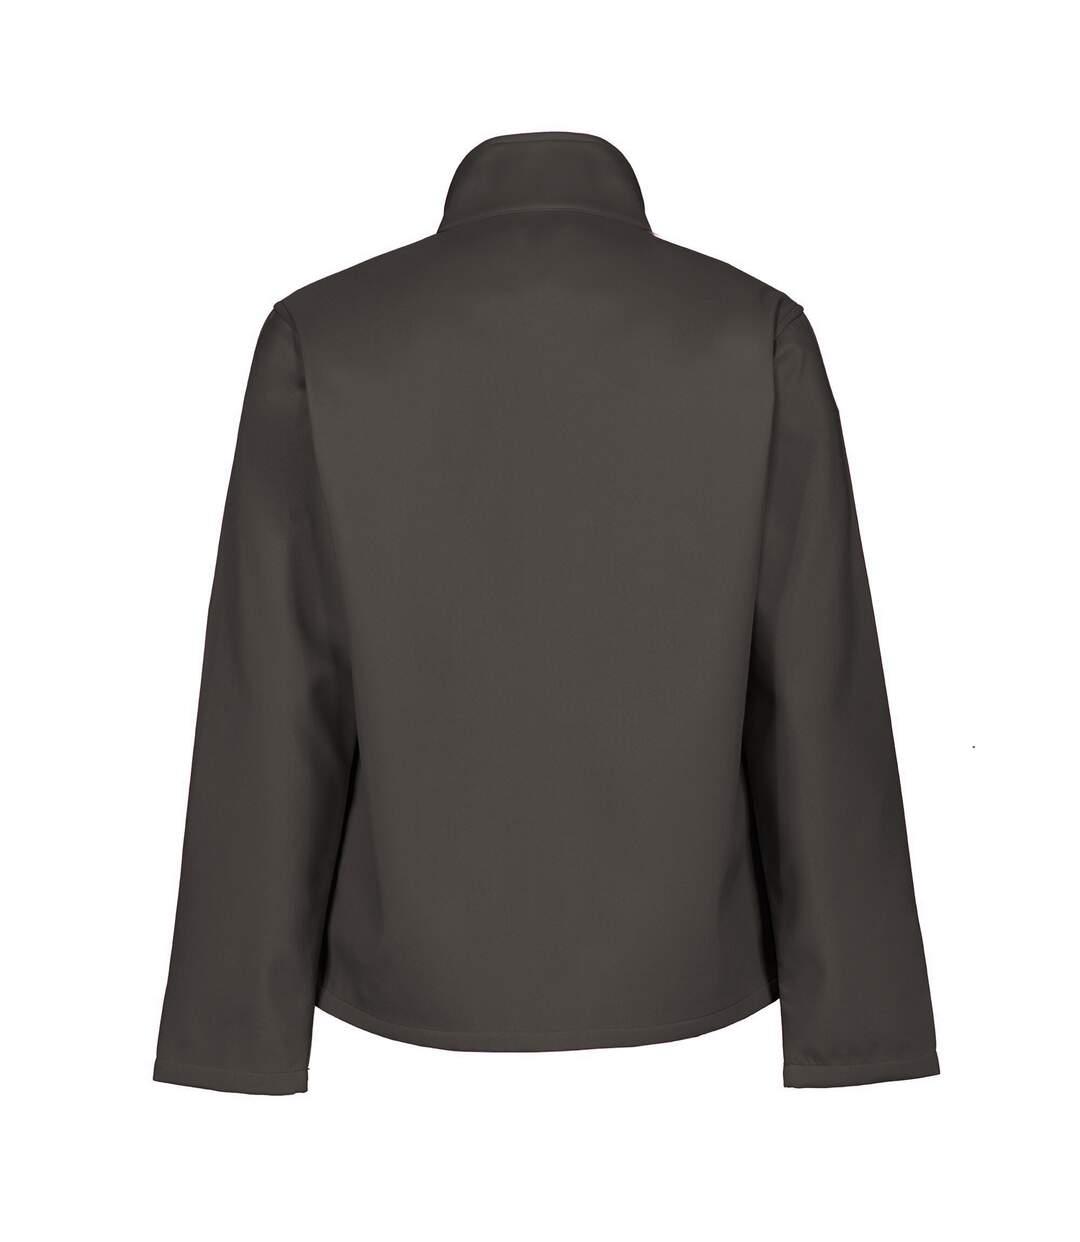 Regatta Mens Ablaze Printable Softshell Jacket (Seal Grey/Black) - UTRG3560